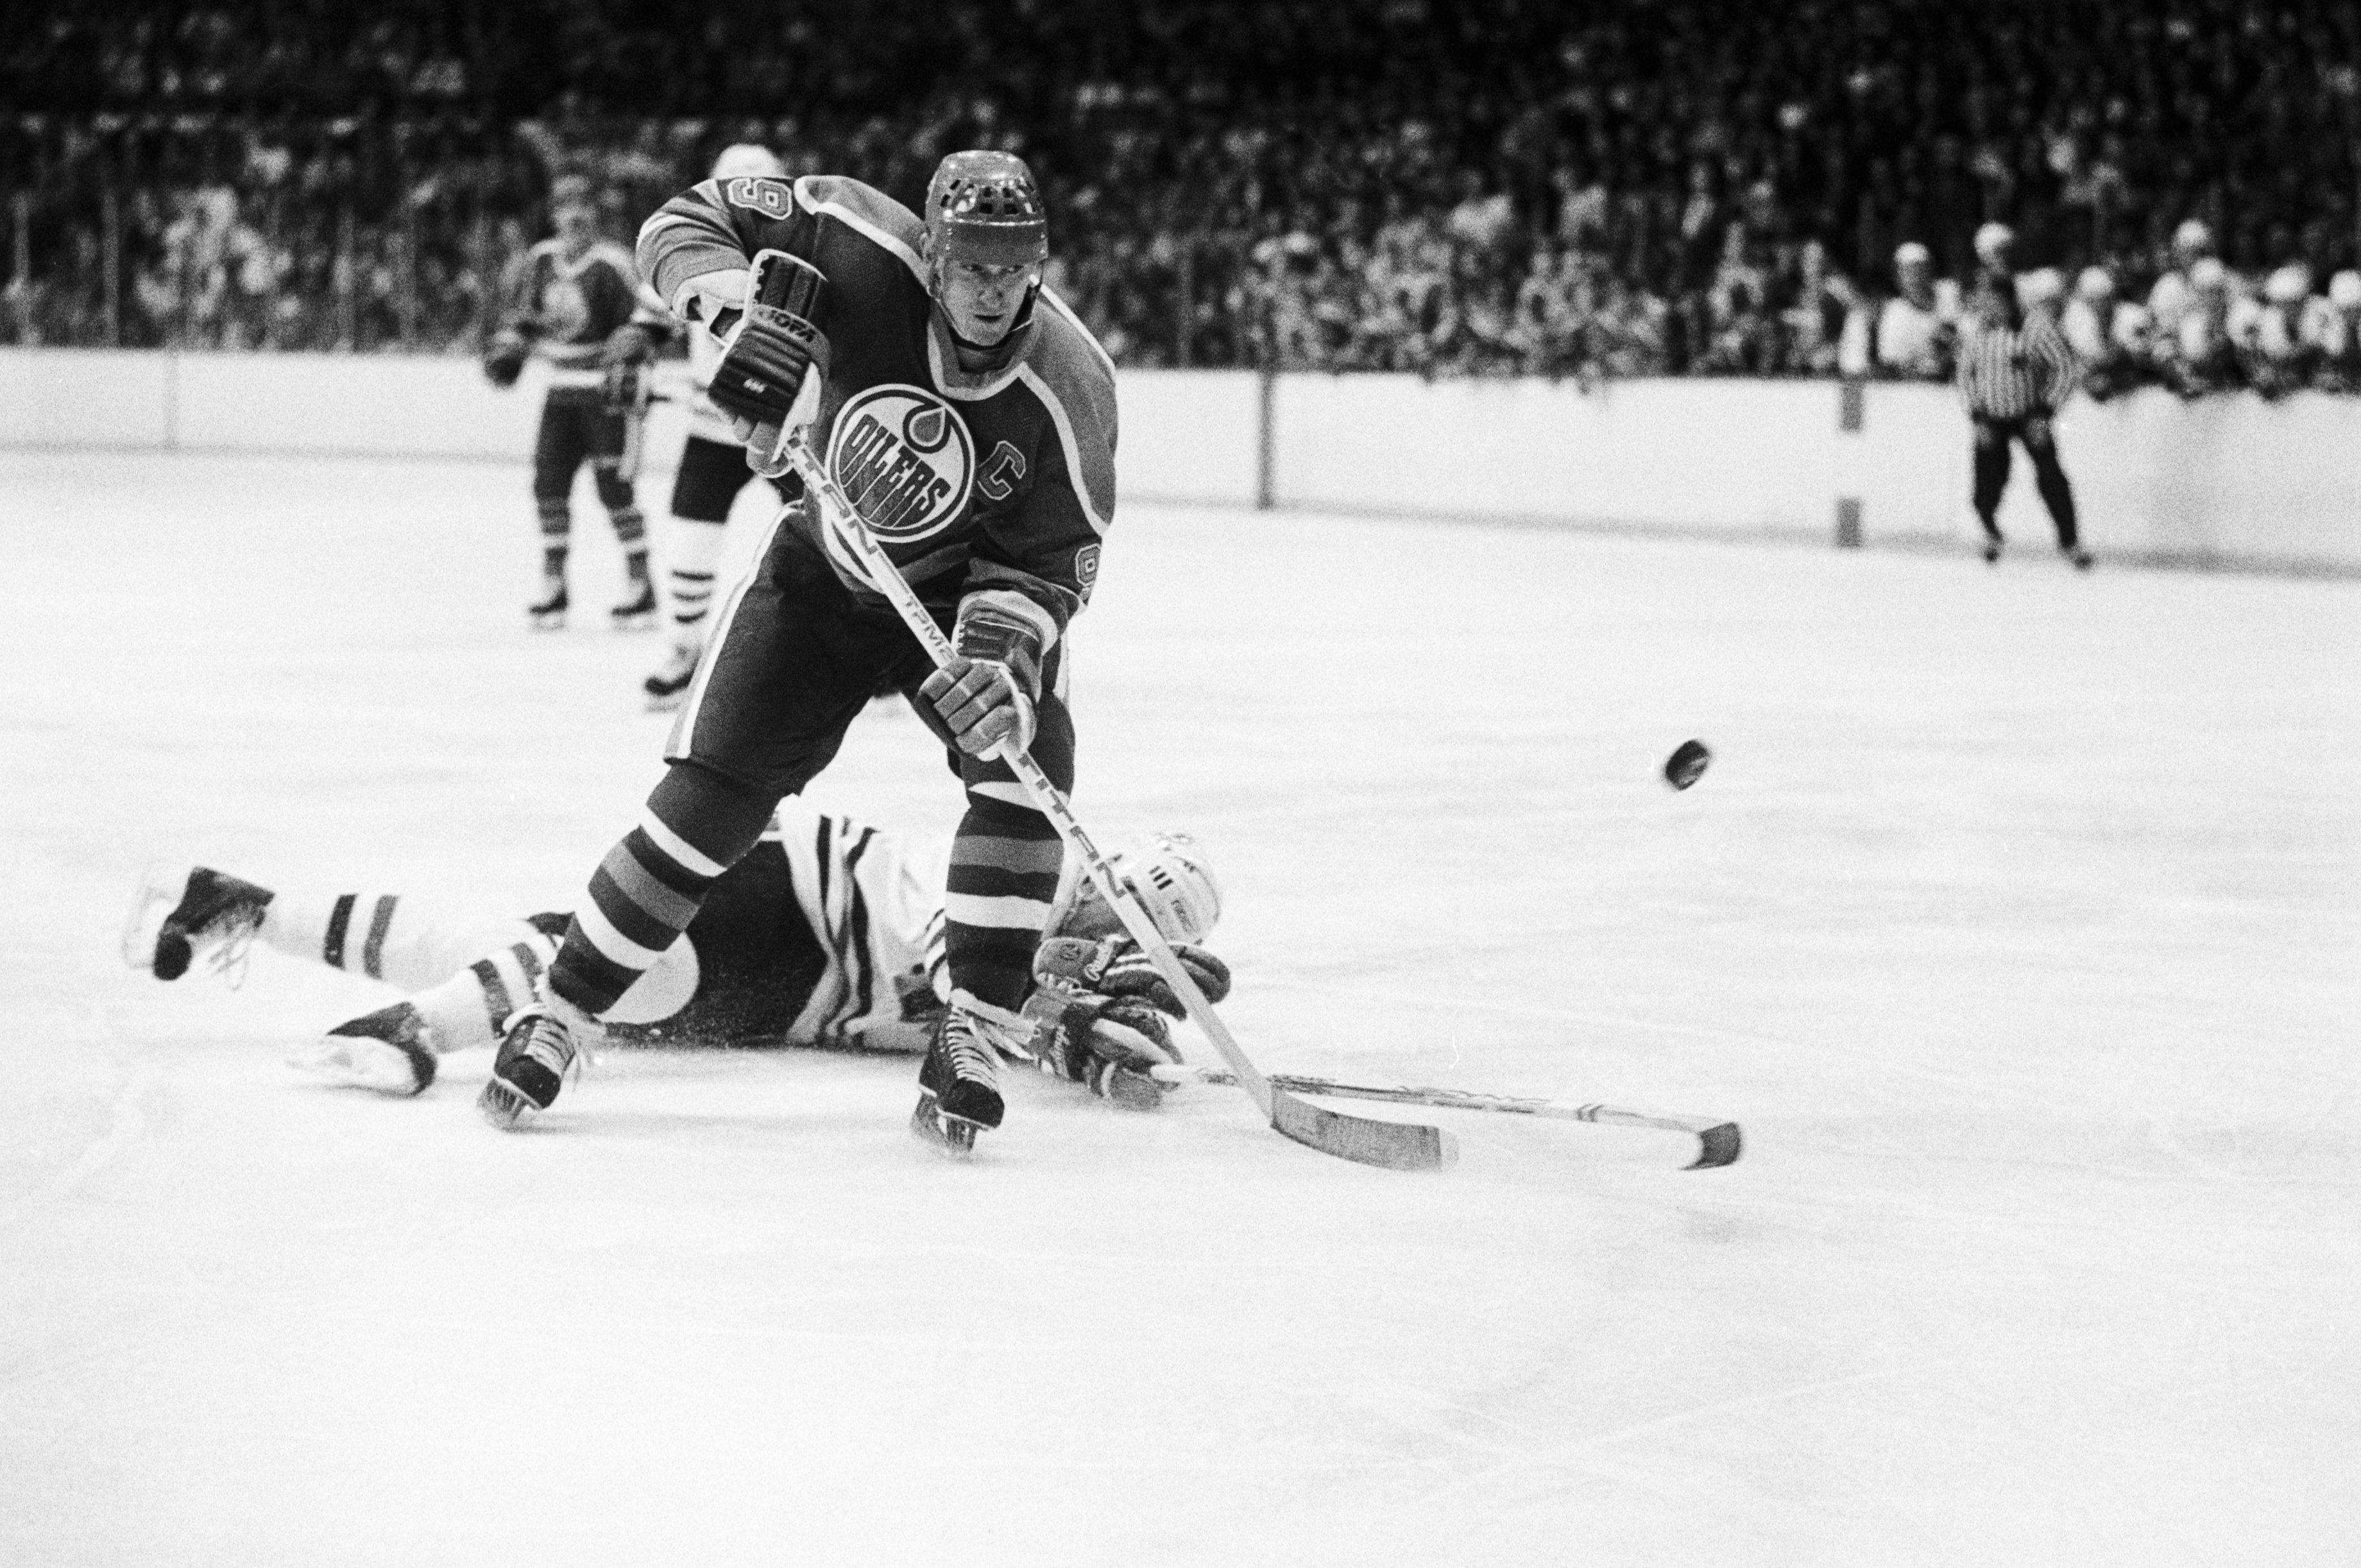 Wayne Gretzky Skating With the Puck